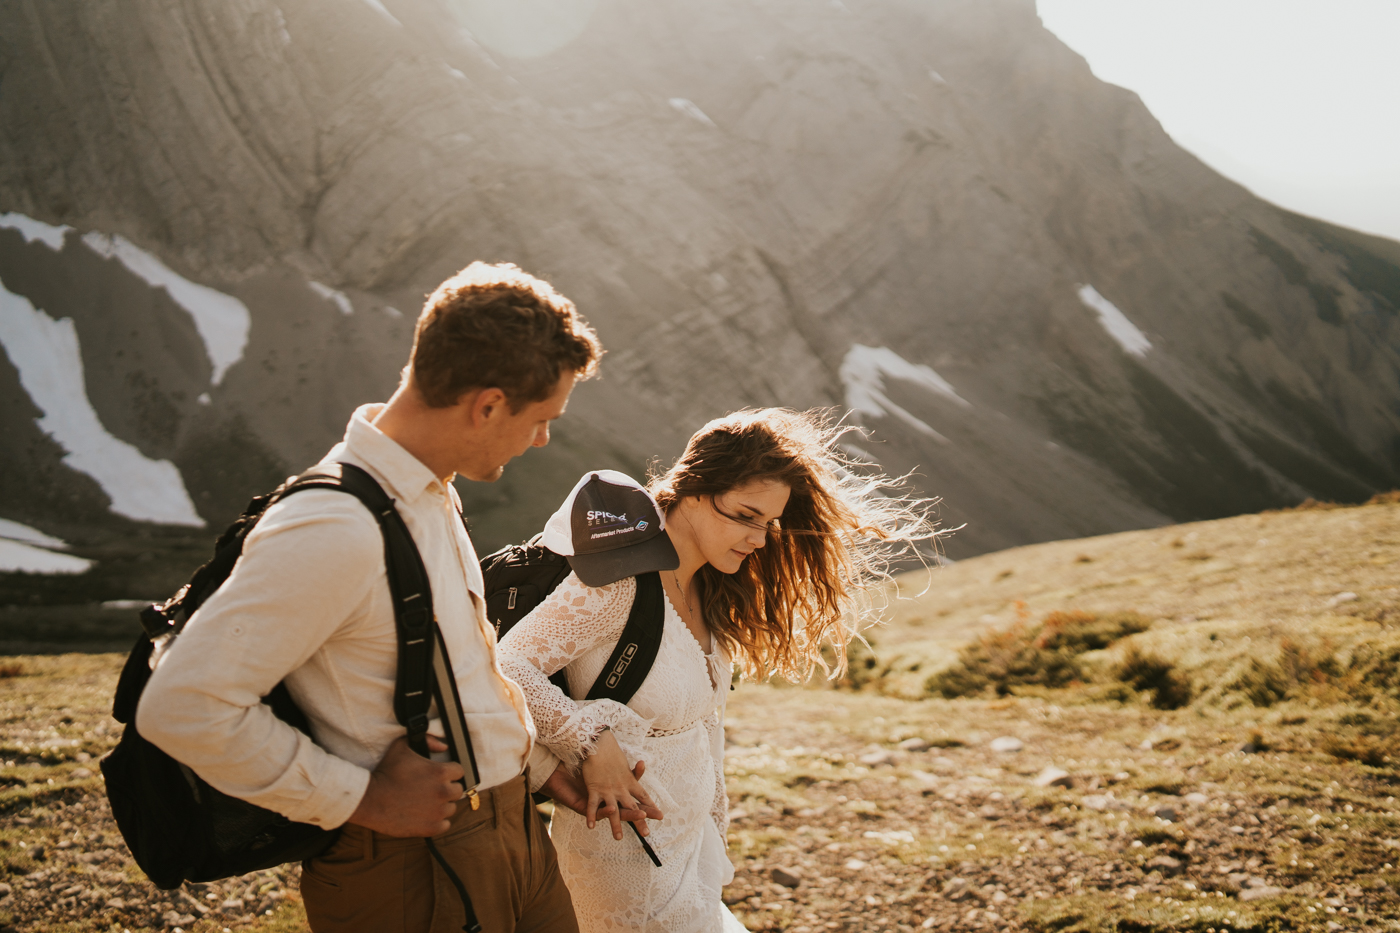 tyraephotography_photographer_wedding_elopement_engagement_photography-08495.jpg